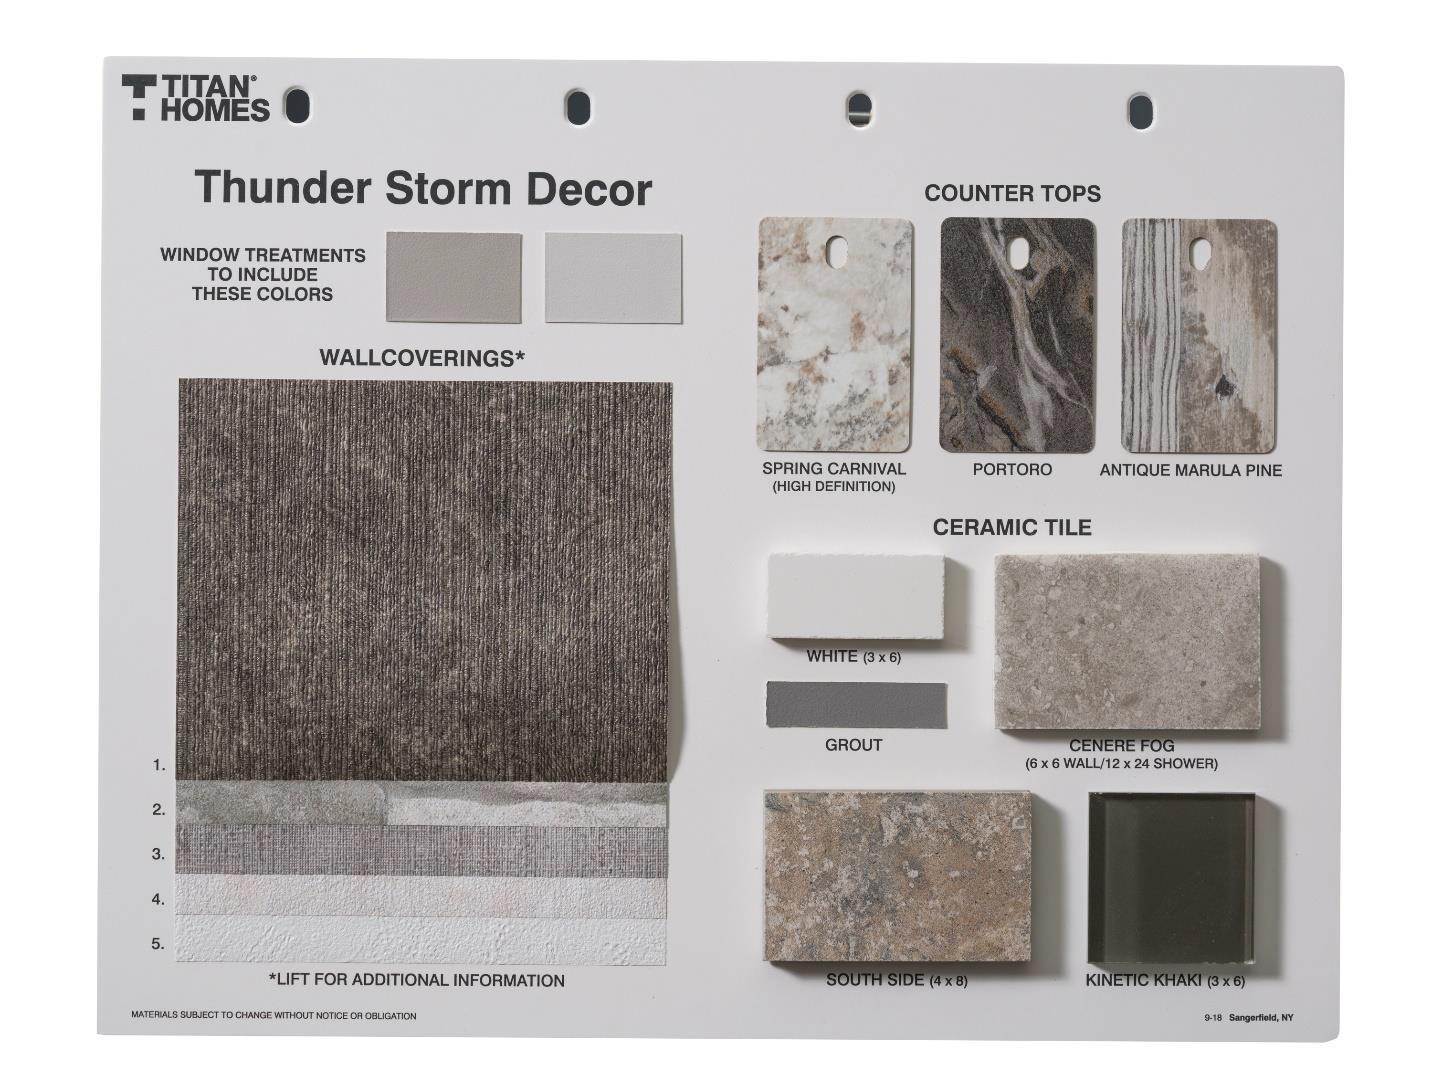 Thunder Storm Decor